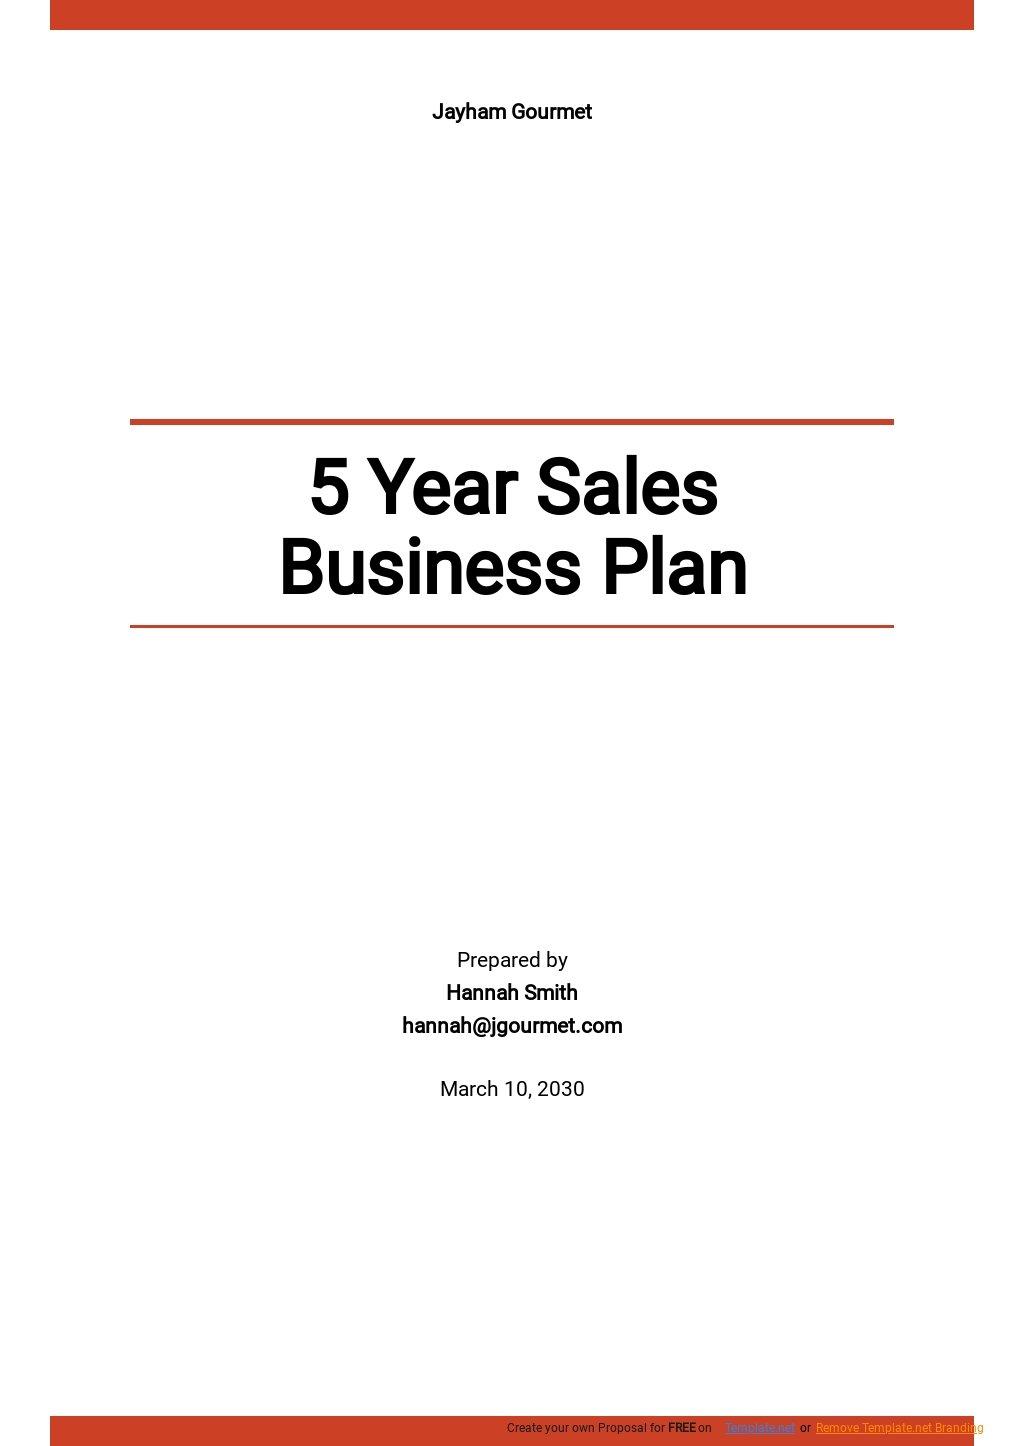 5 Year Sales Business Plan Template.jpe